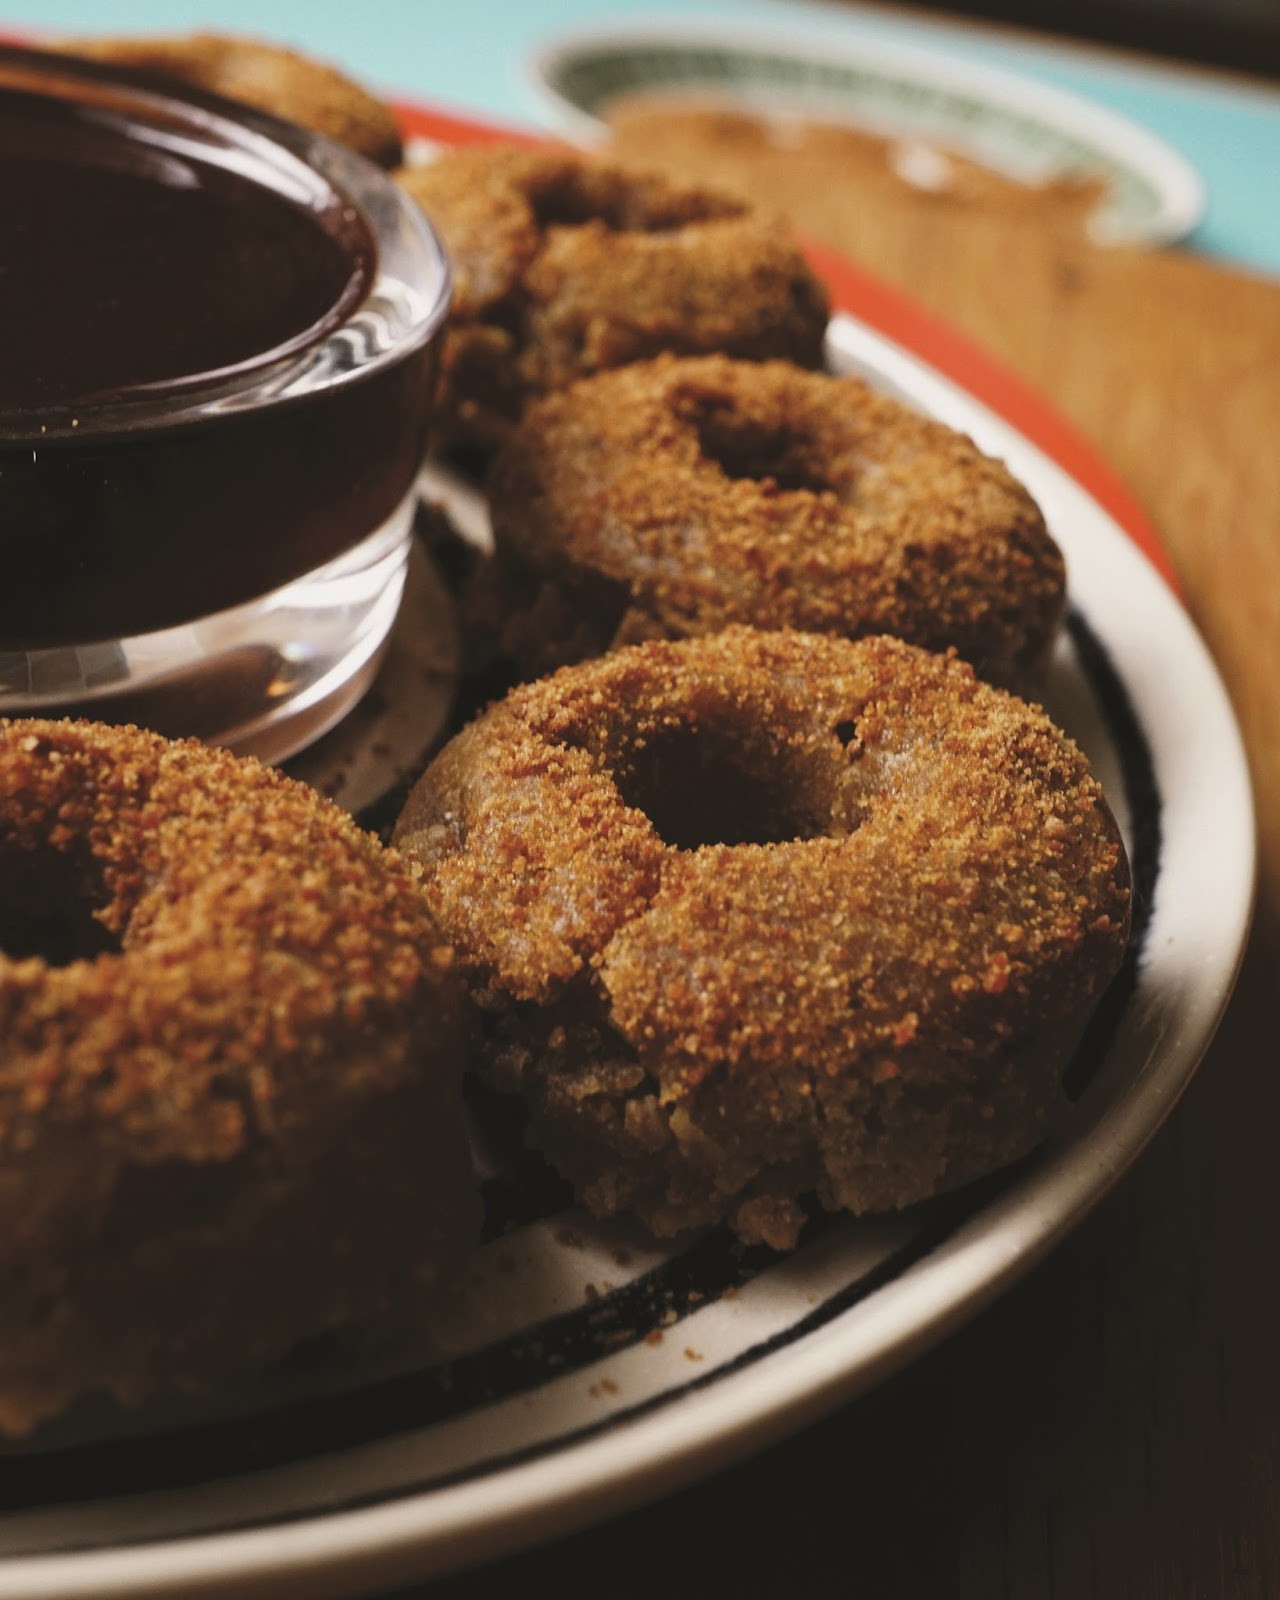 Gluten Free Doughnuts With Dark Chocolate Sauce